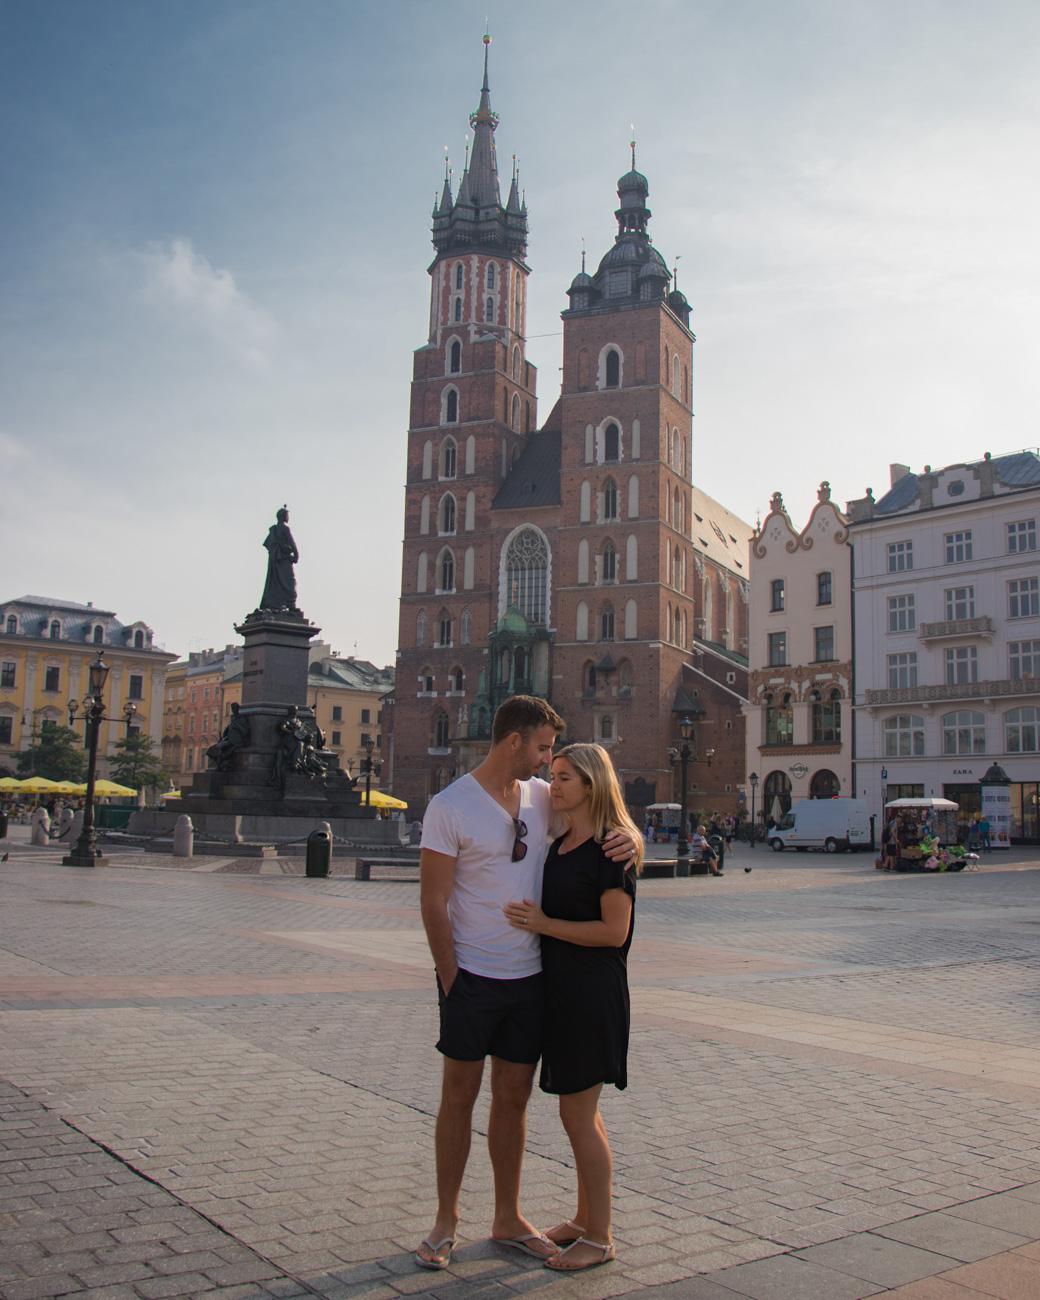 Krakow Clock Tower